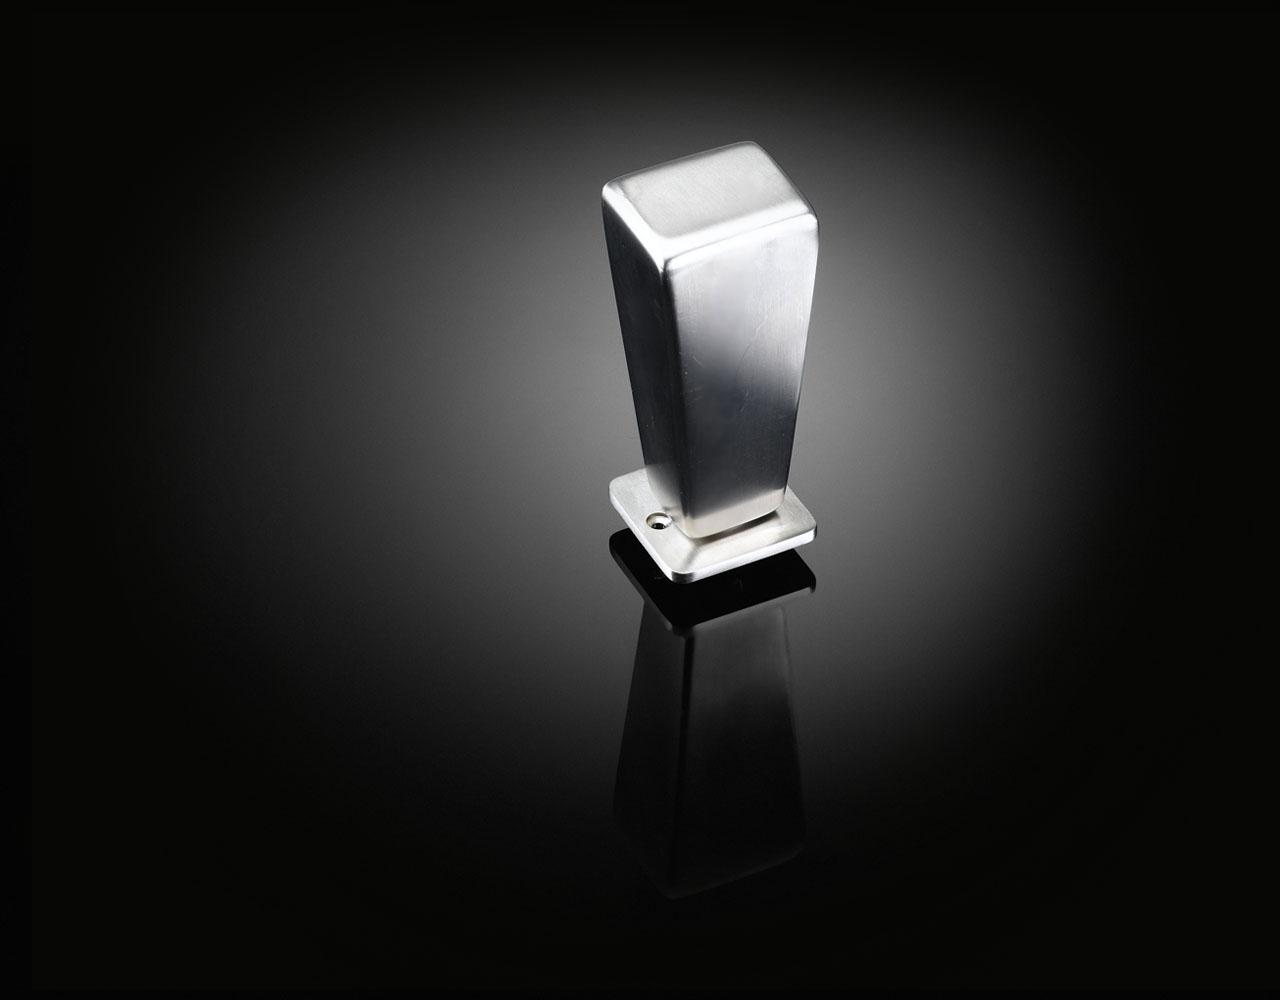 Luxury door knob designed by David Adjaye in satin stainless steel finish supplied by izé DAK01